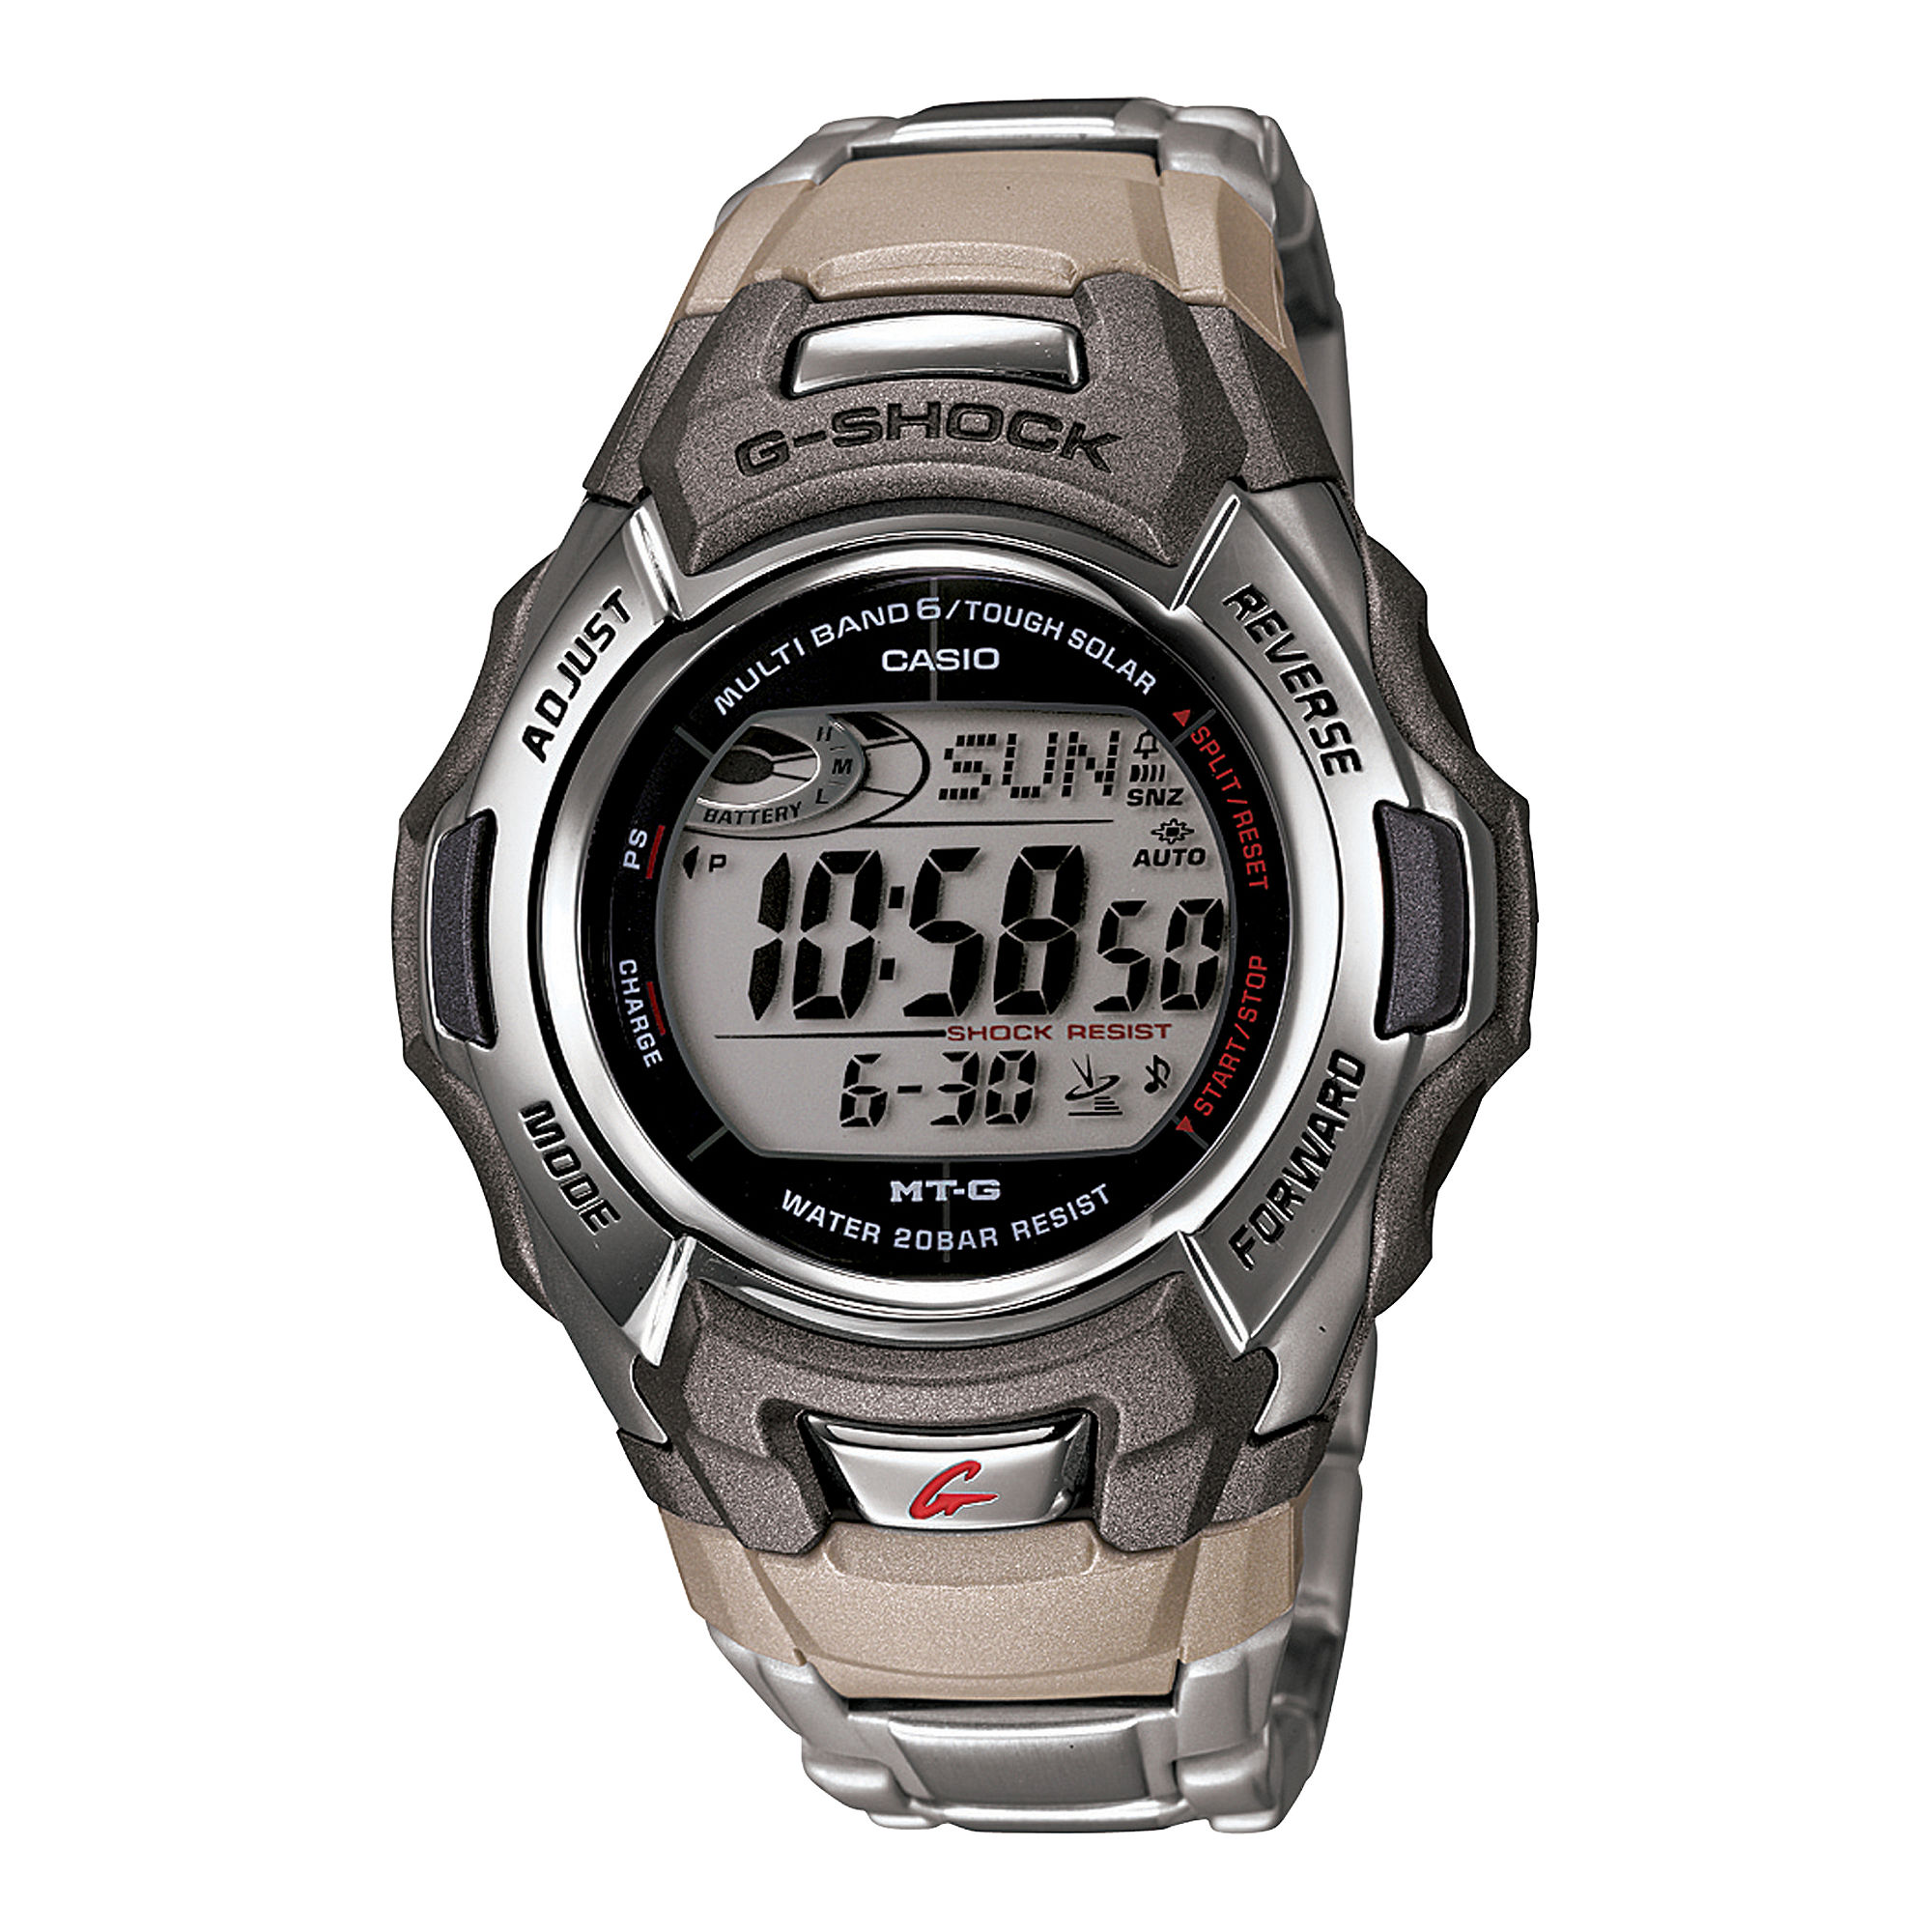 Casio G-Shock Mens Multi-Band 6 Atomic Timekeeping Solar Watch MTGM900DA-8